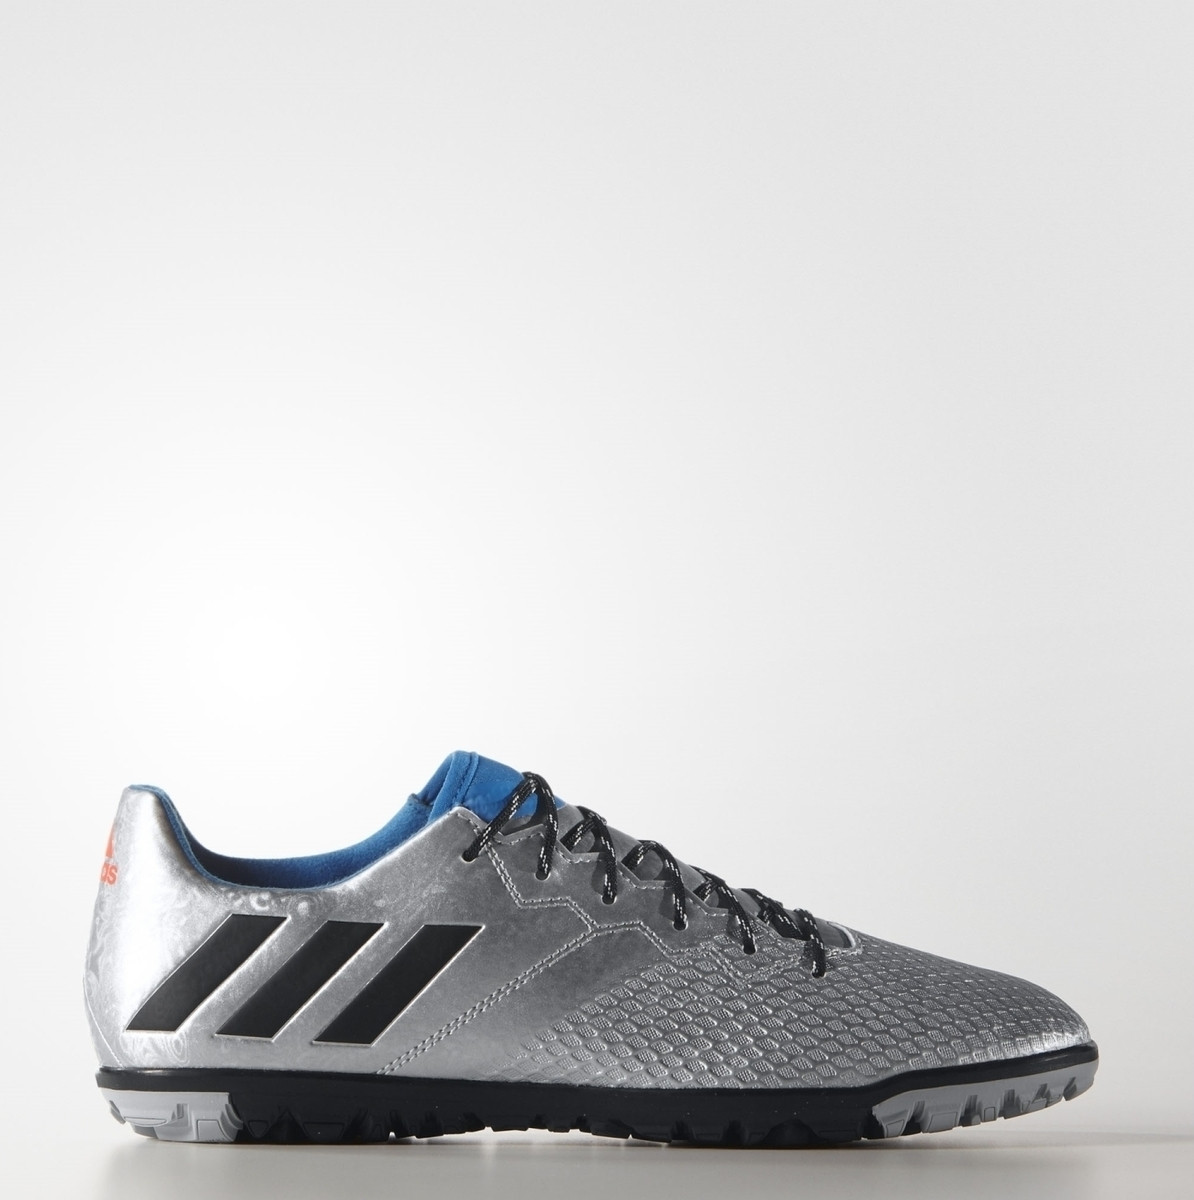 quality design 906c2 1ec80 Kapadaa  Adidas Metallic Blue Messi 16.3 Turf Football Shoes For Men –  S79642